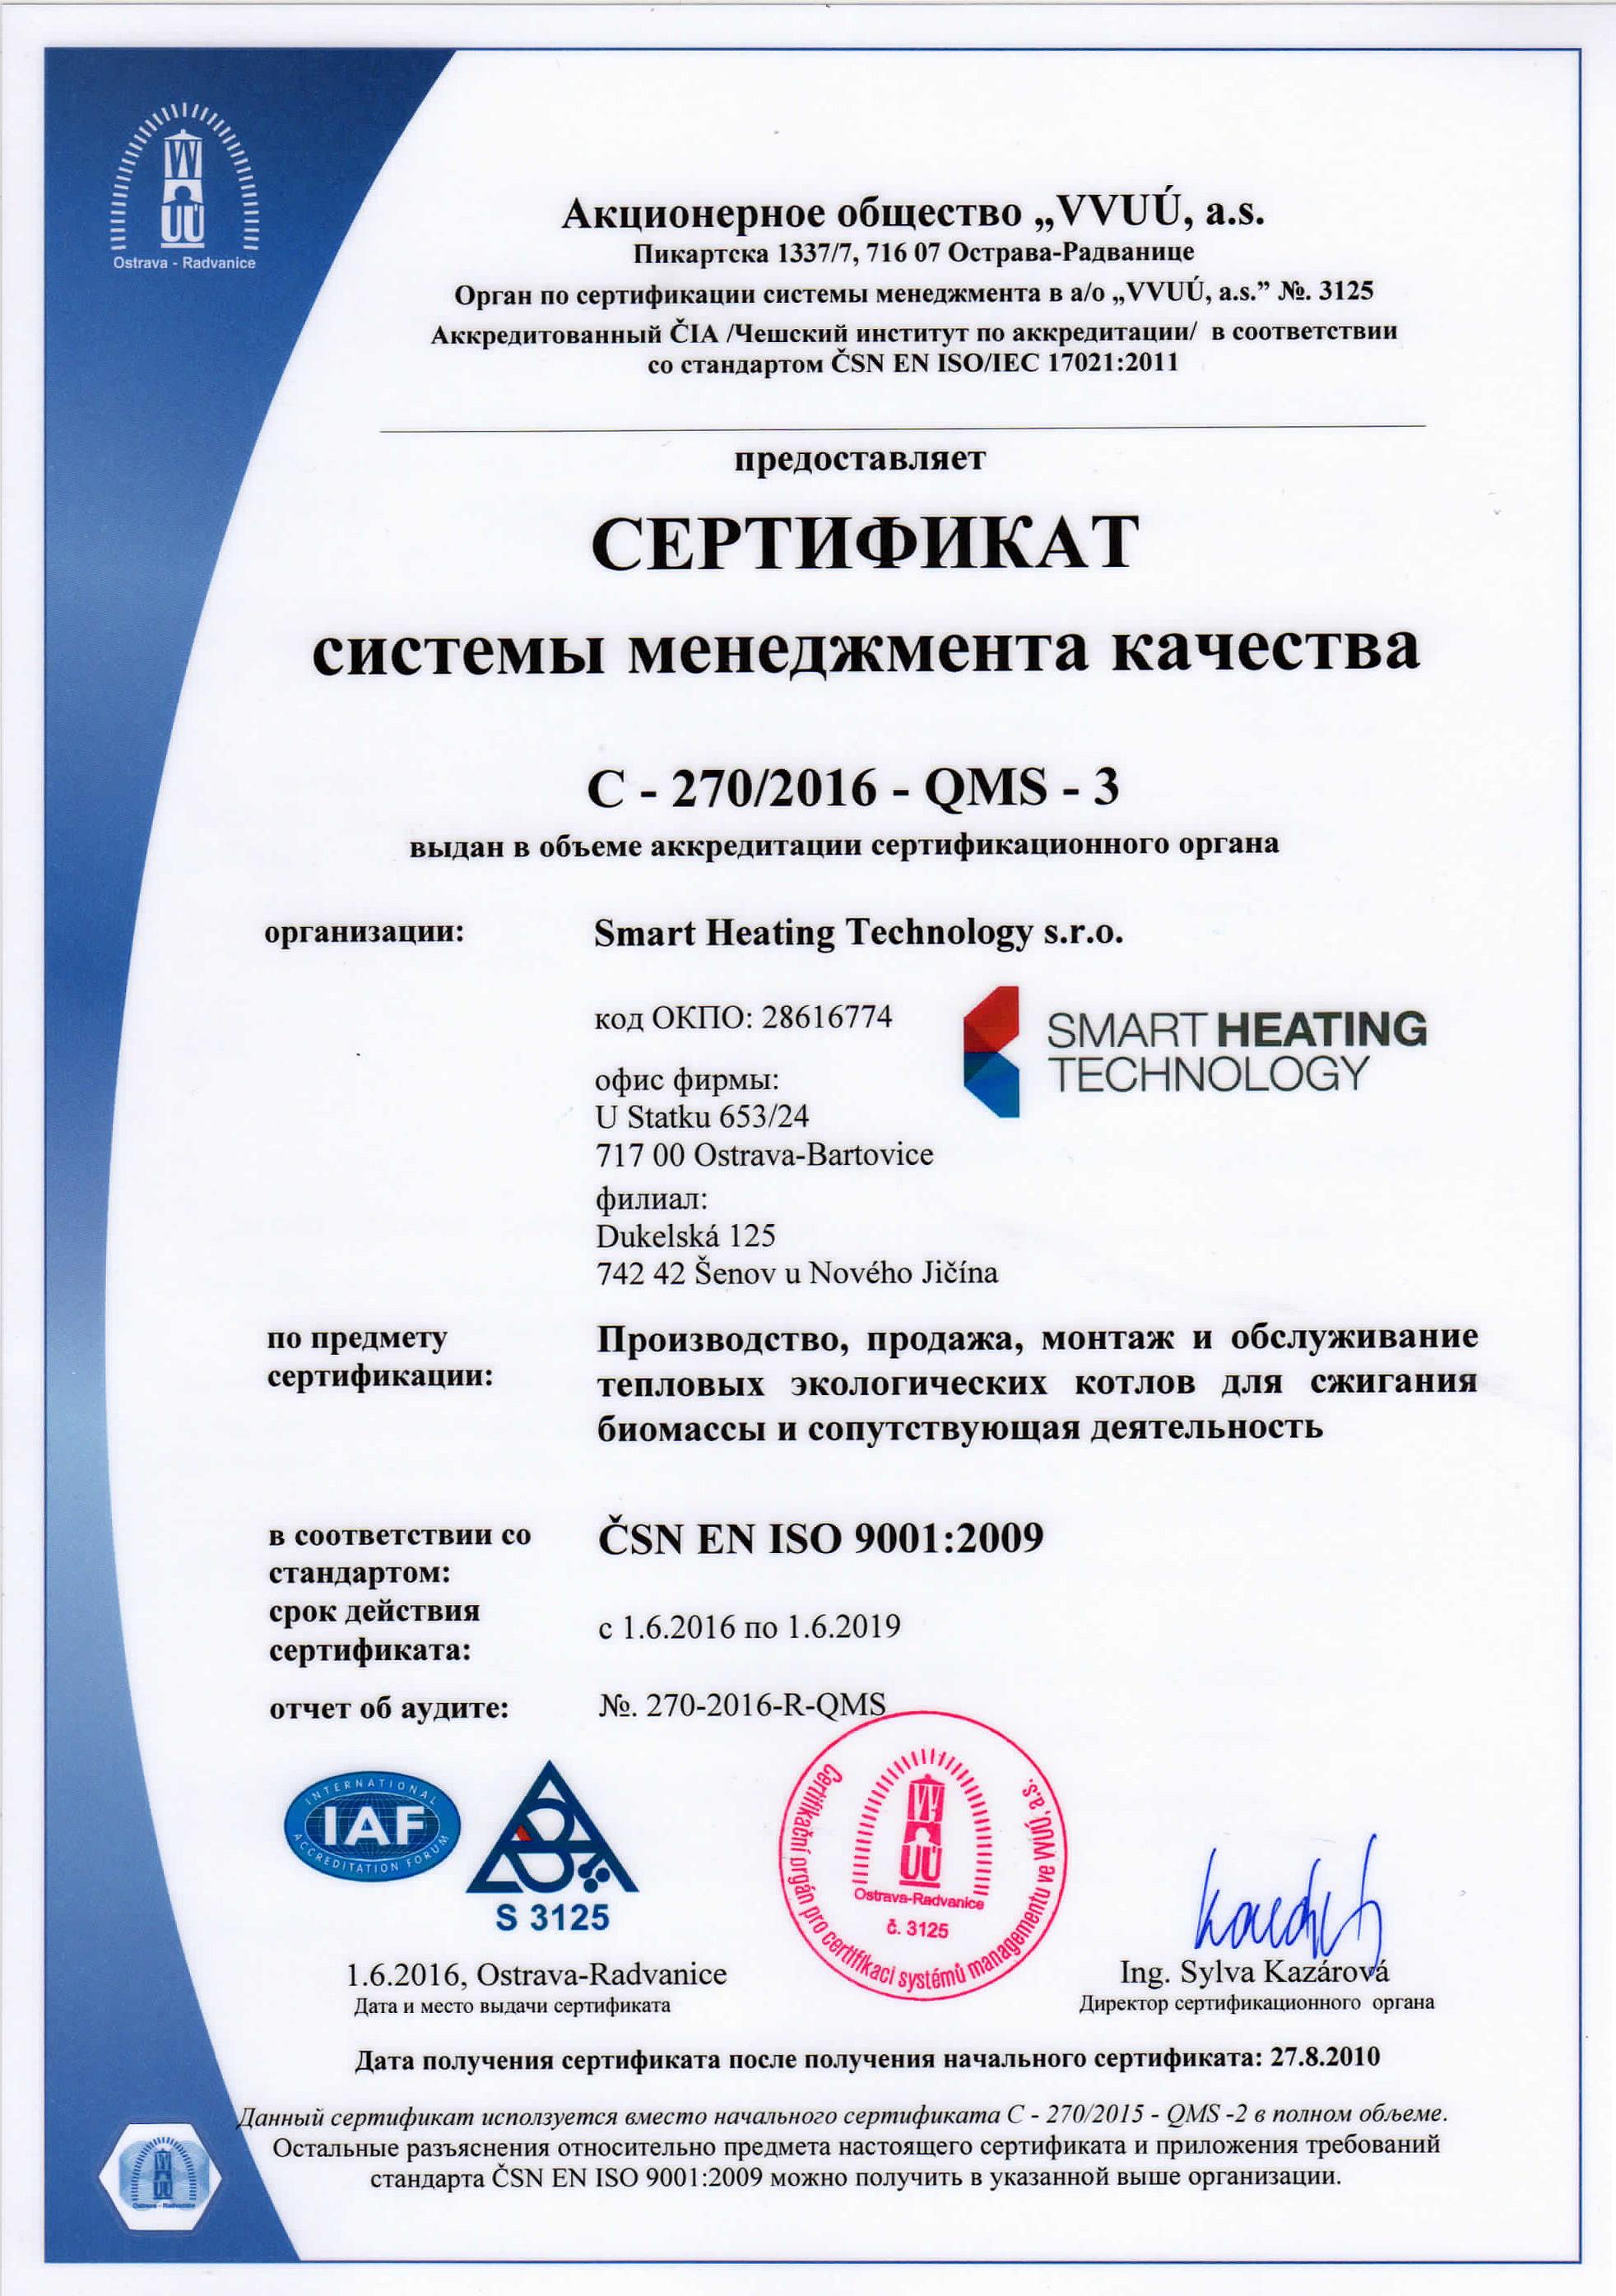 certifikat-c_270_2016-qms_3-ru